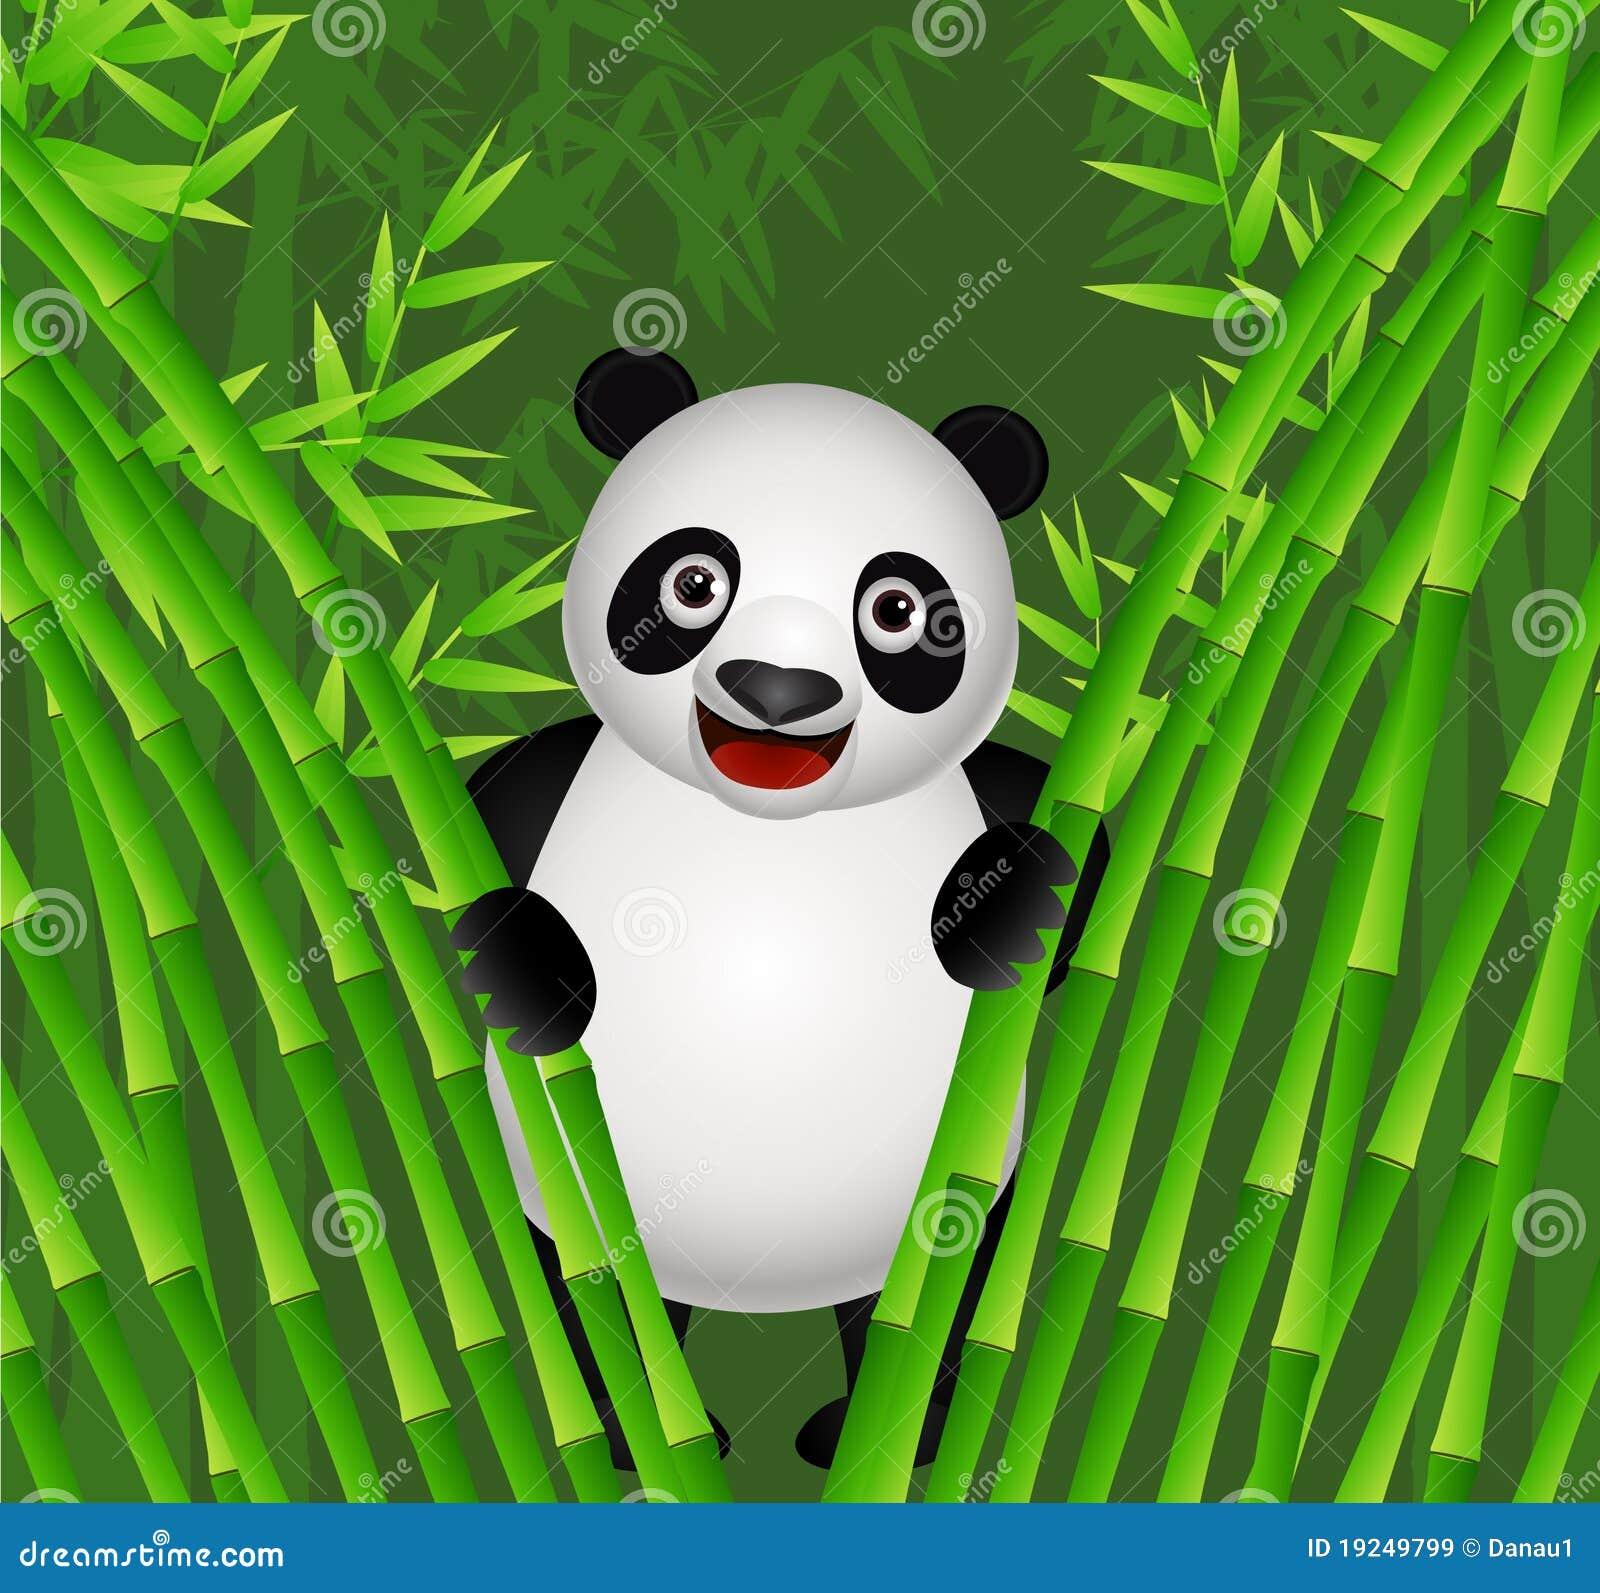 Cute Panda Cartoon In The Nature Royalty Free Stock Images Image